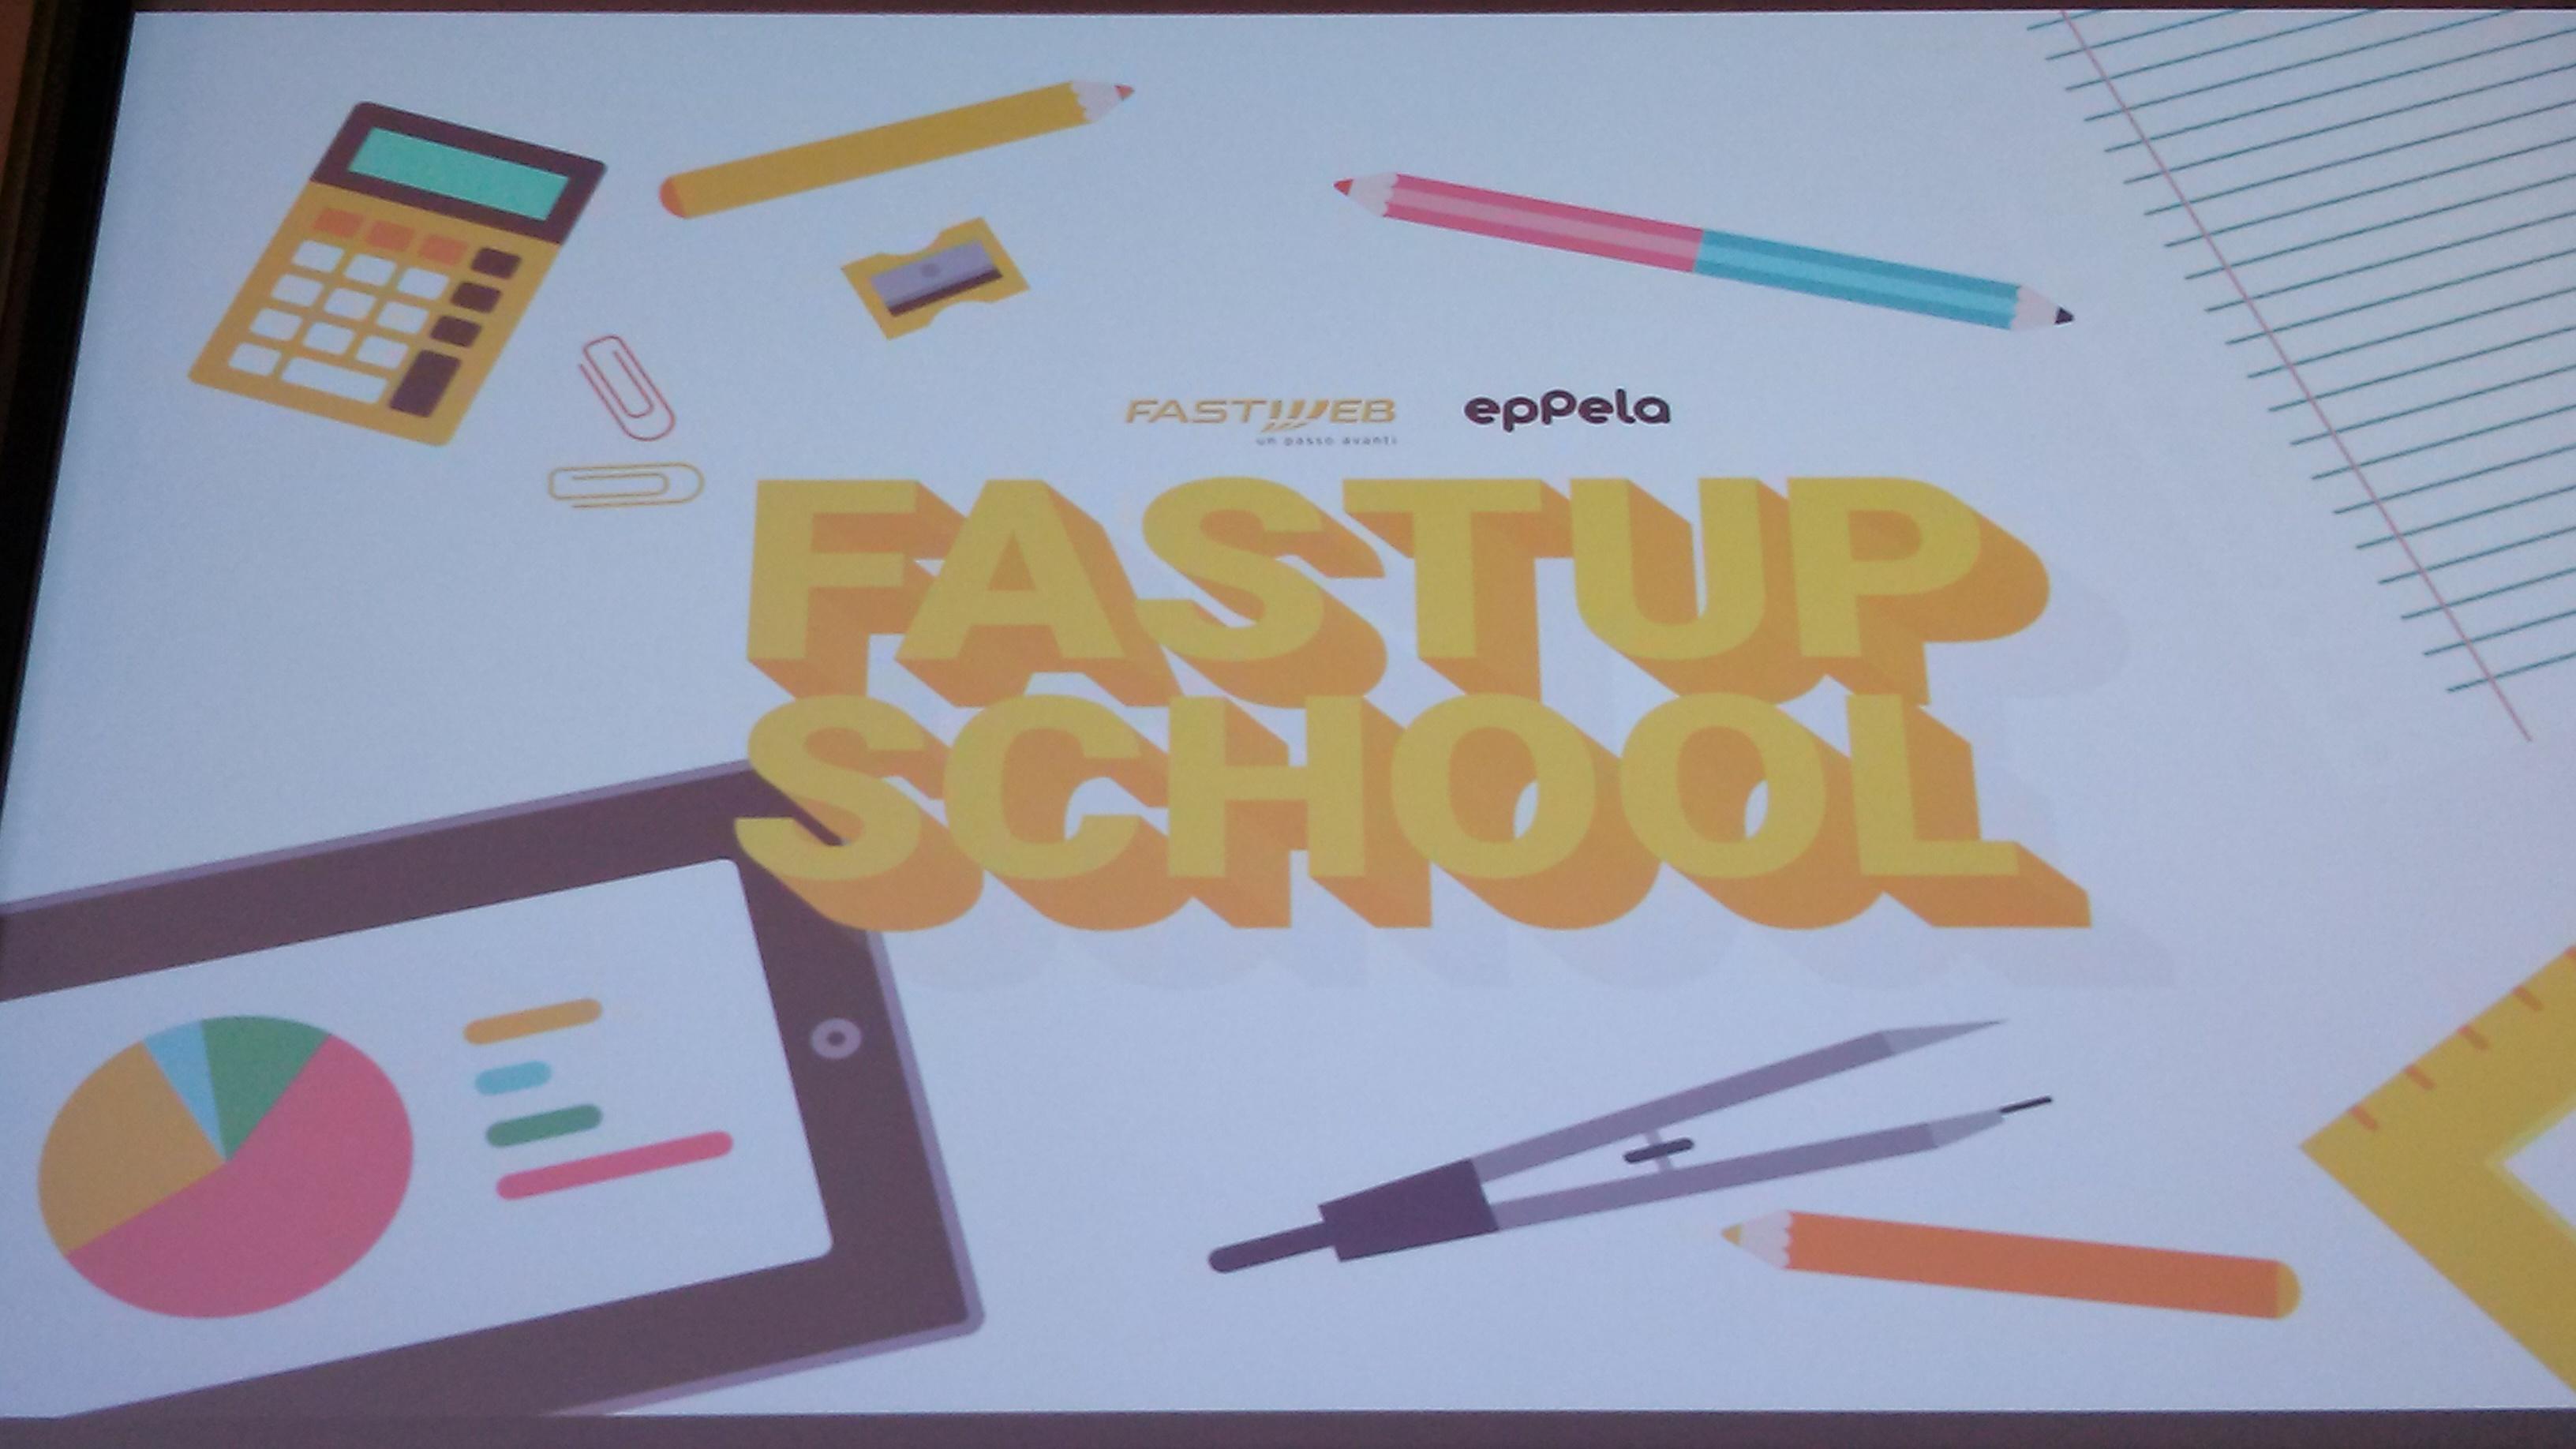 fast up school